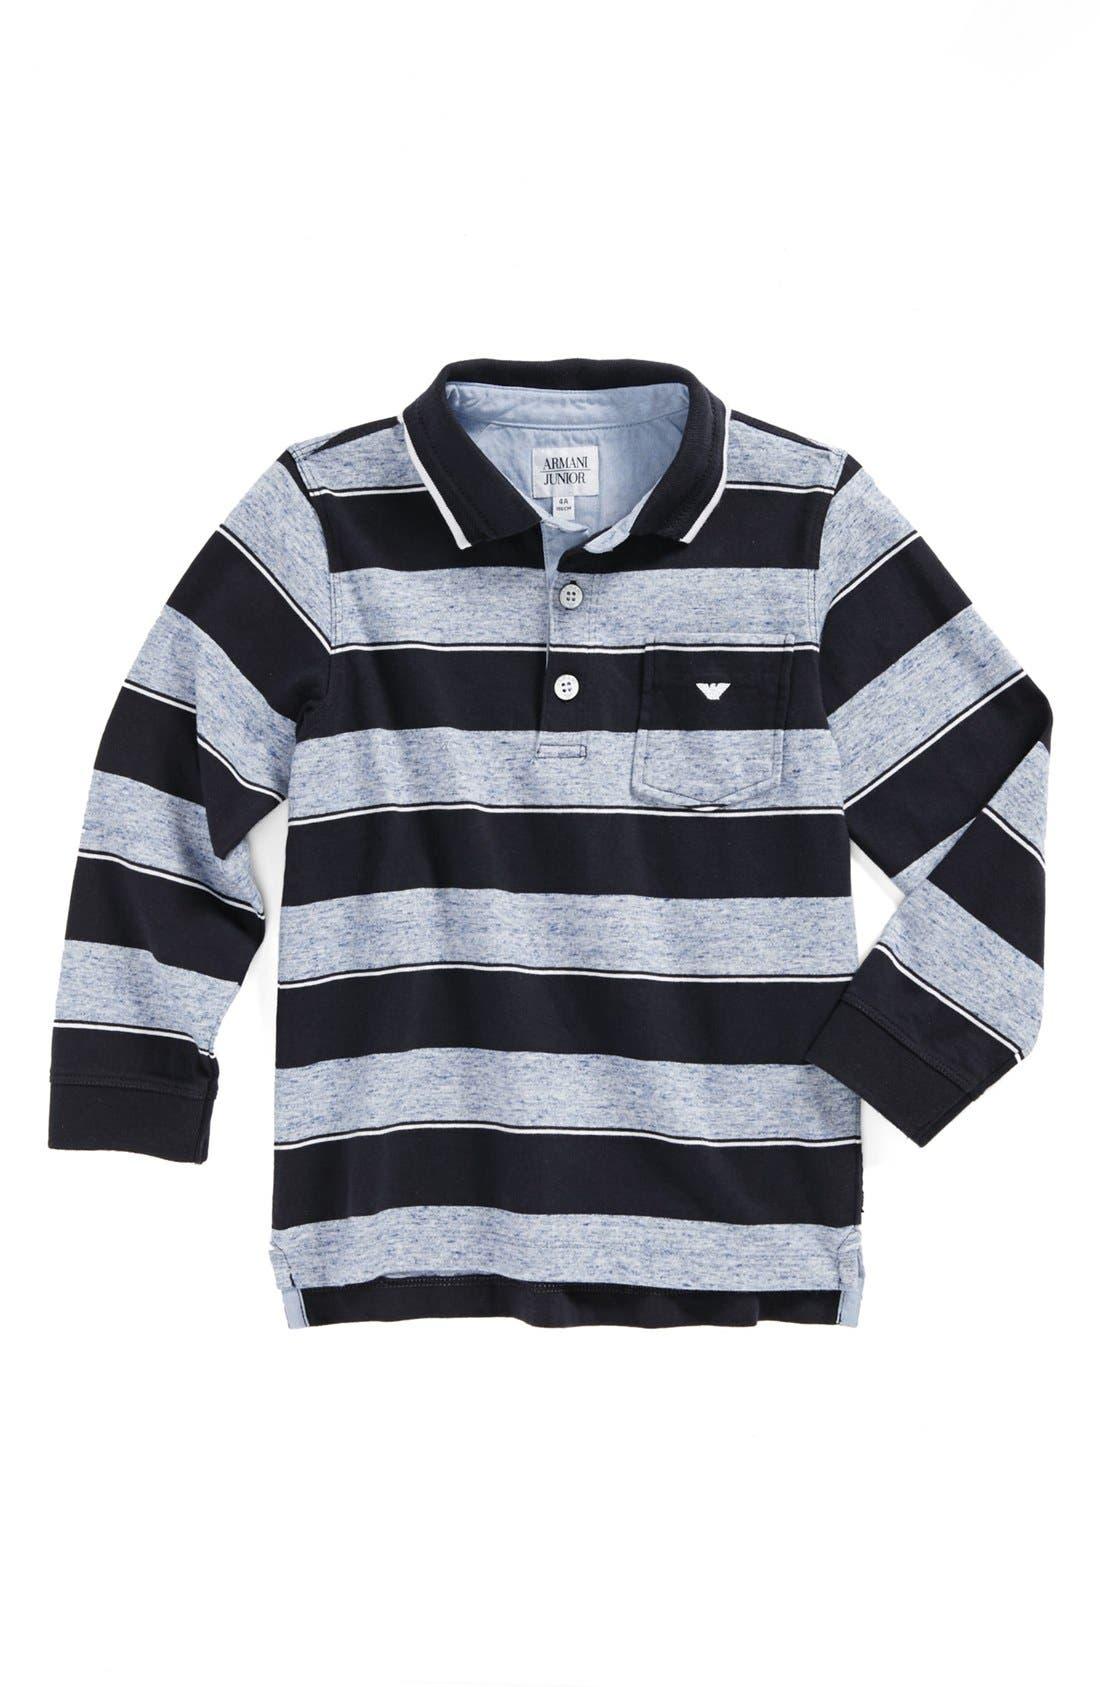 Main Image - Armani Junior Stripe Cotton Polo (Toddler Boys)